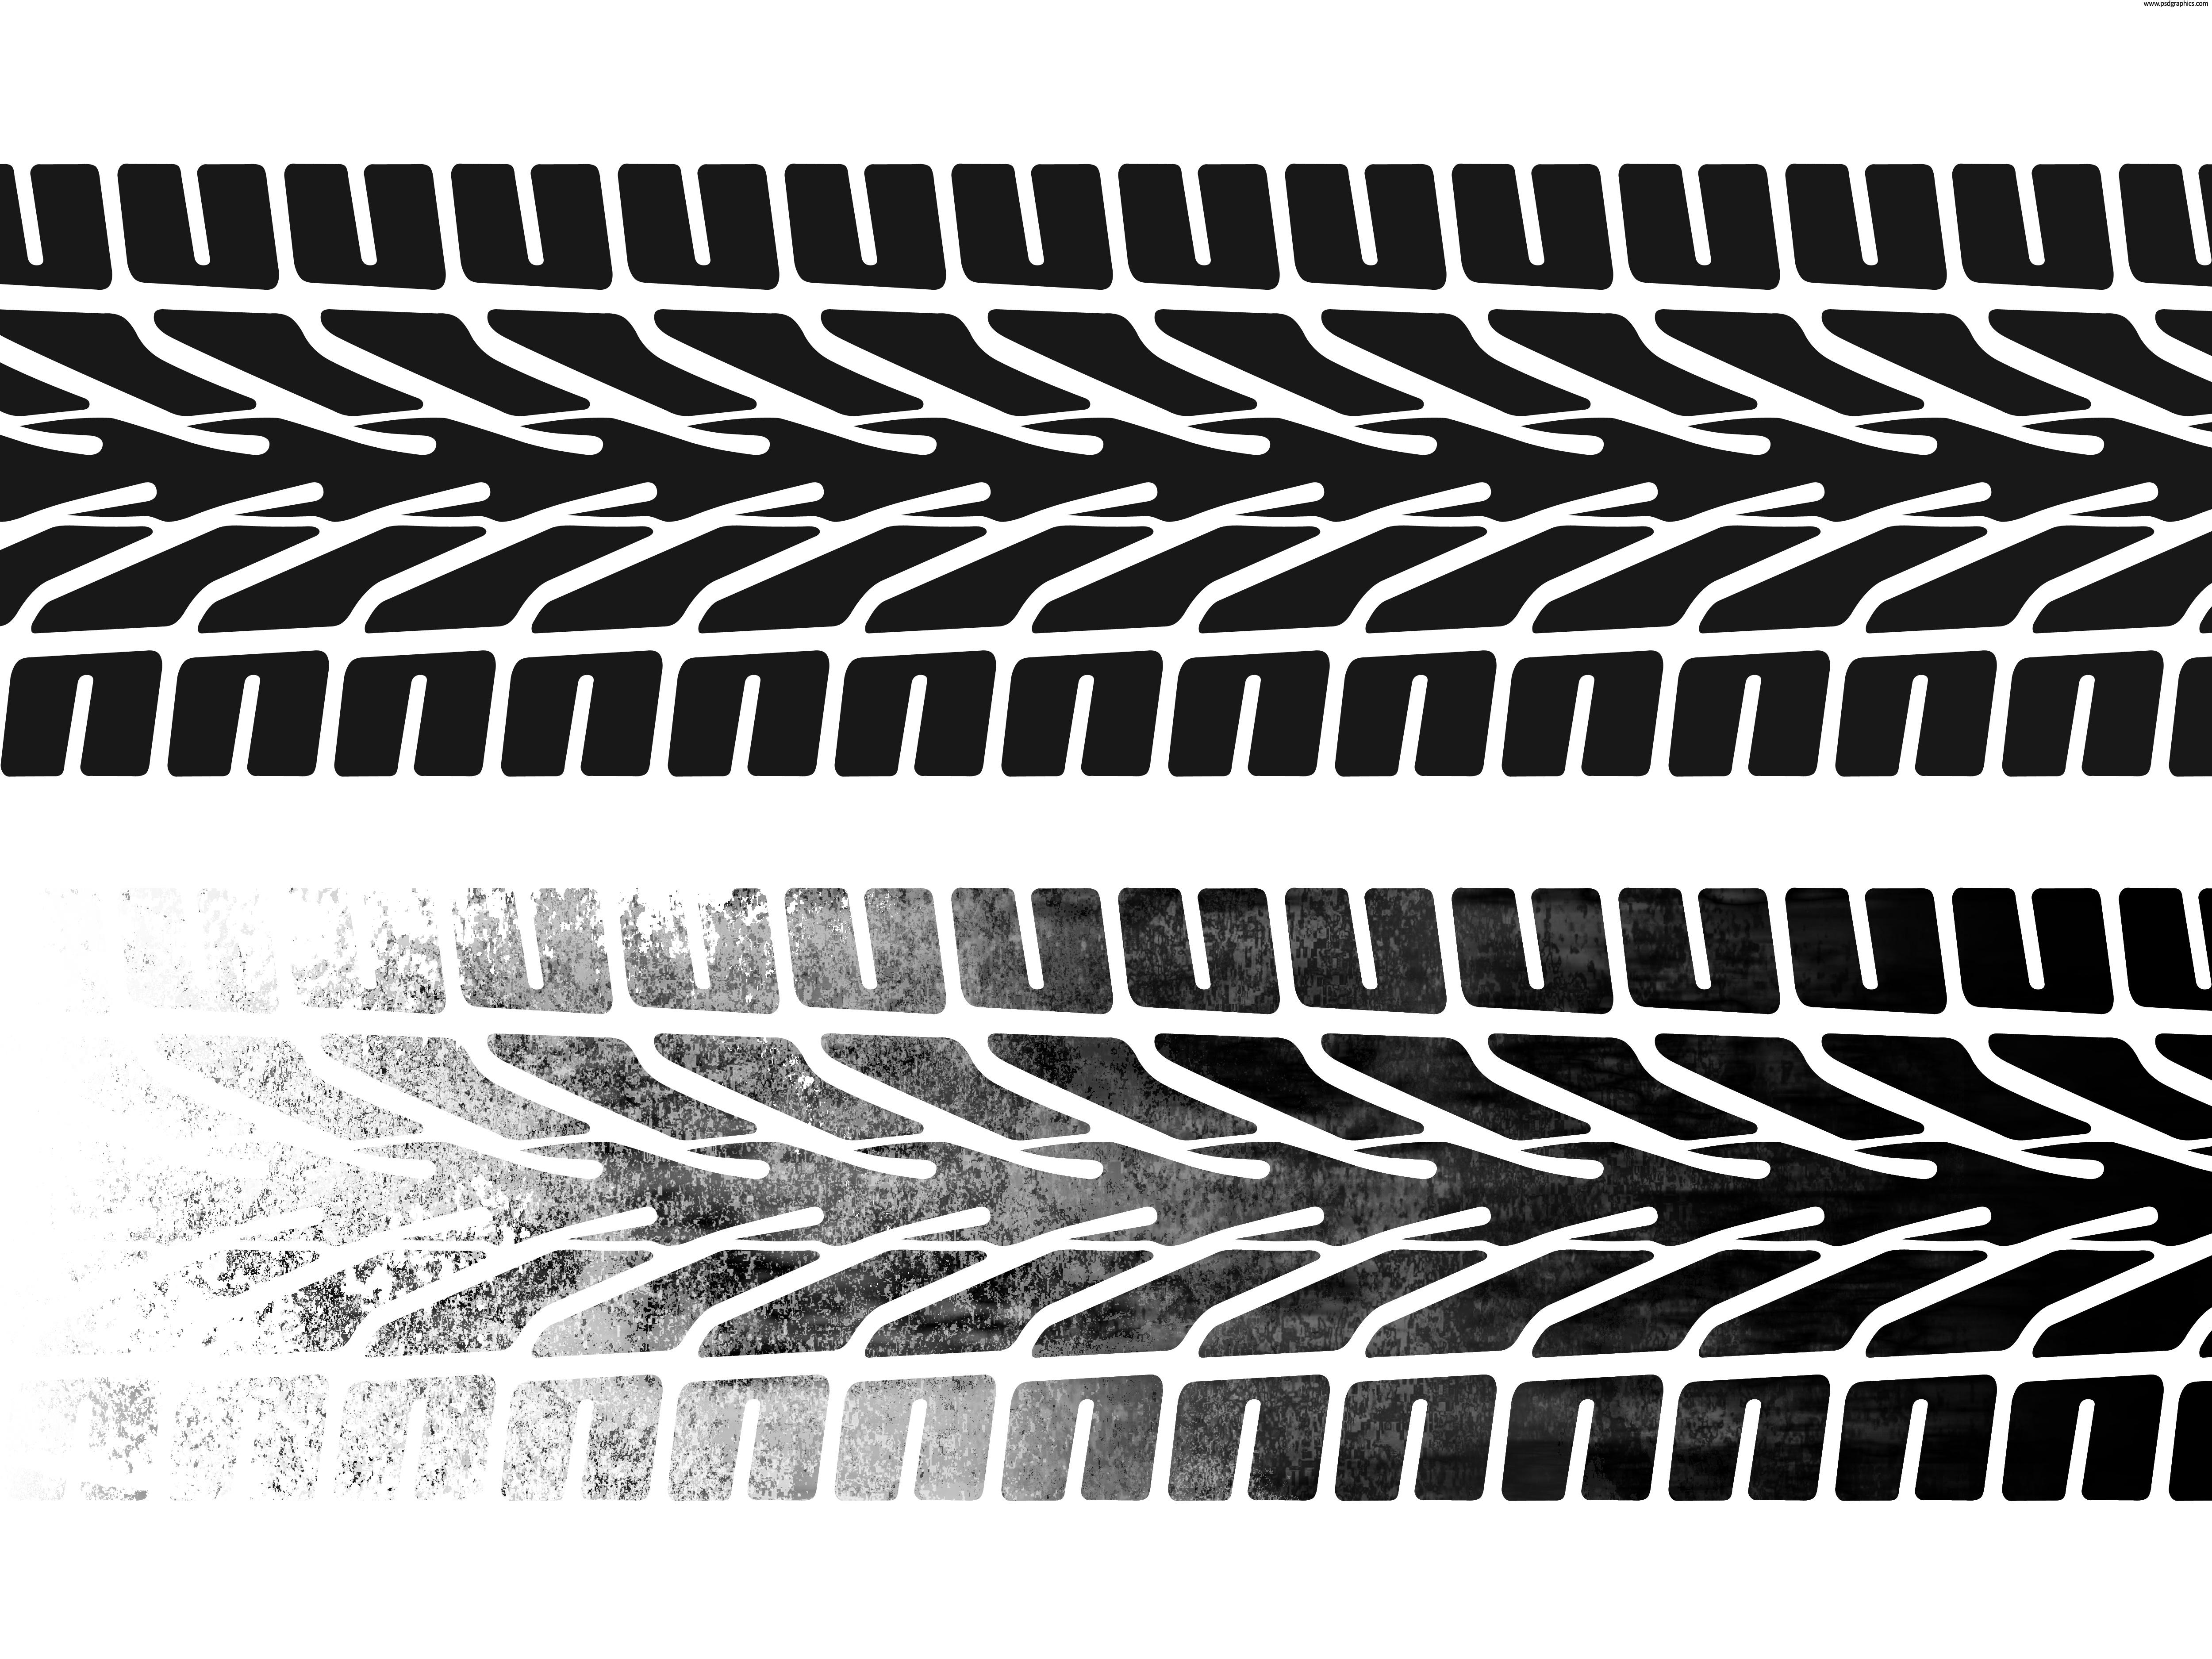 5000x3750 Free Photo Tire Imprint Texture